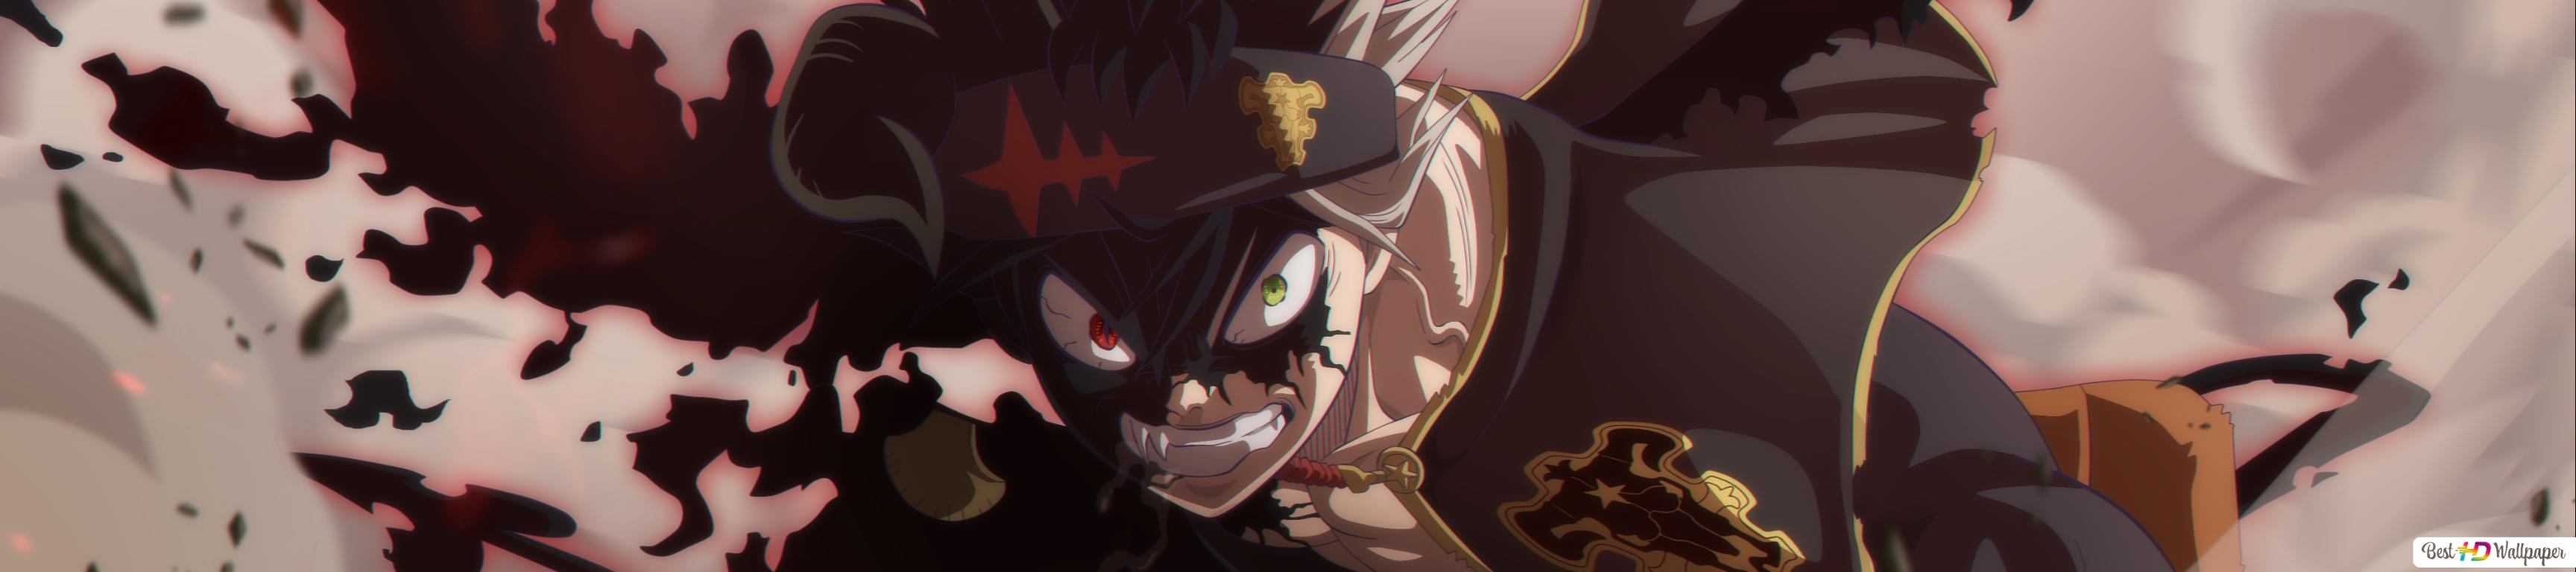 Black Clover Asta New Demon Form Hd Wallpaper Download